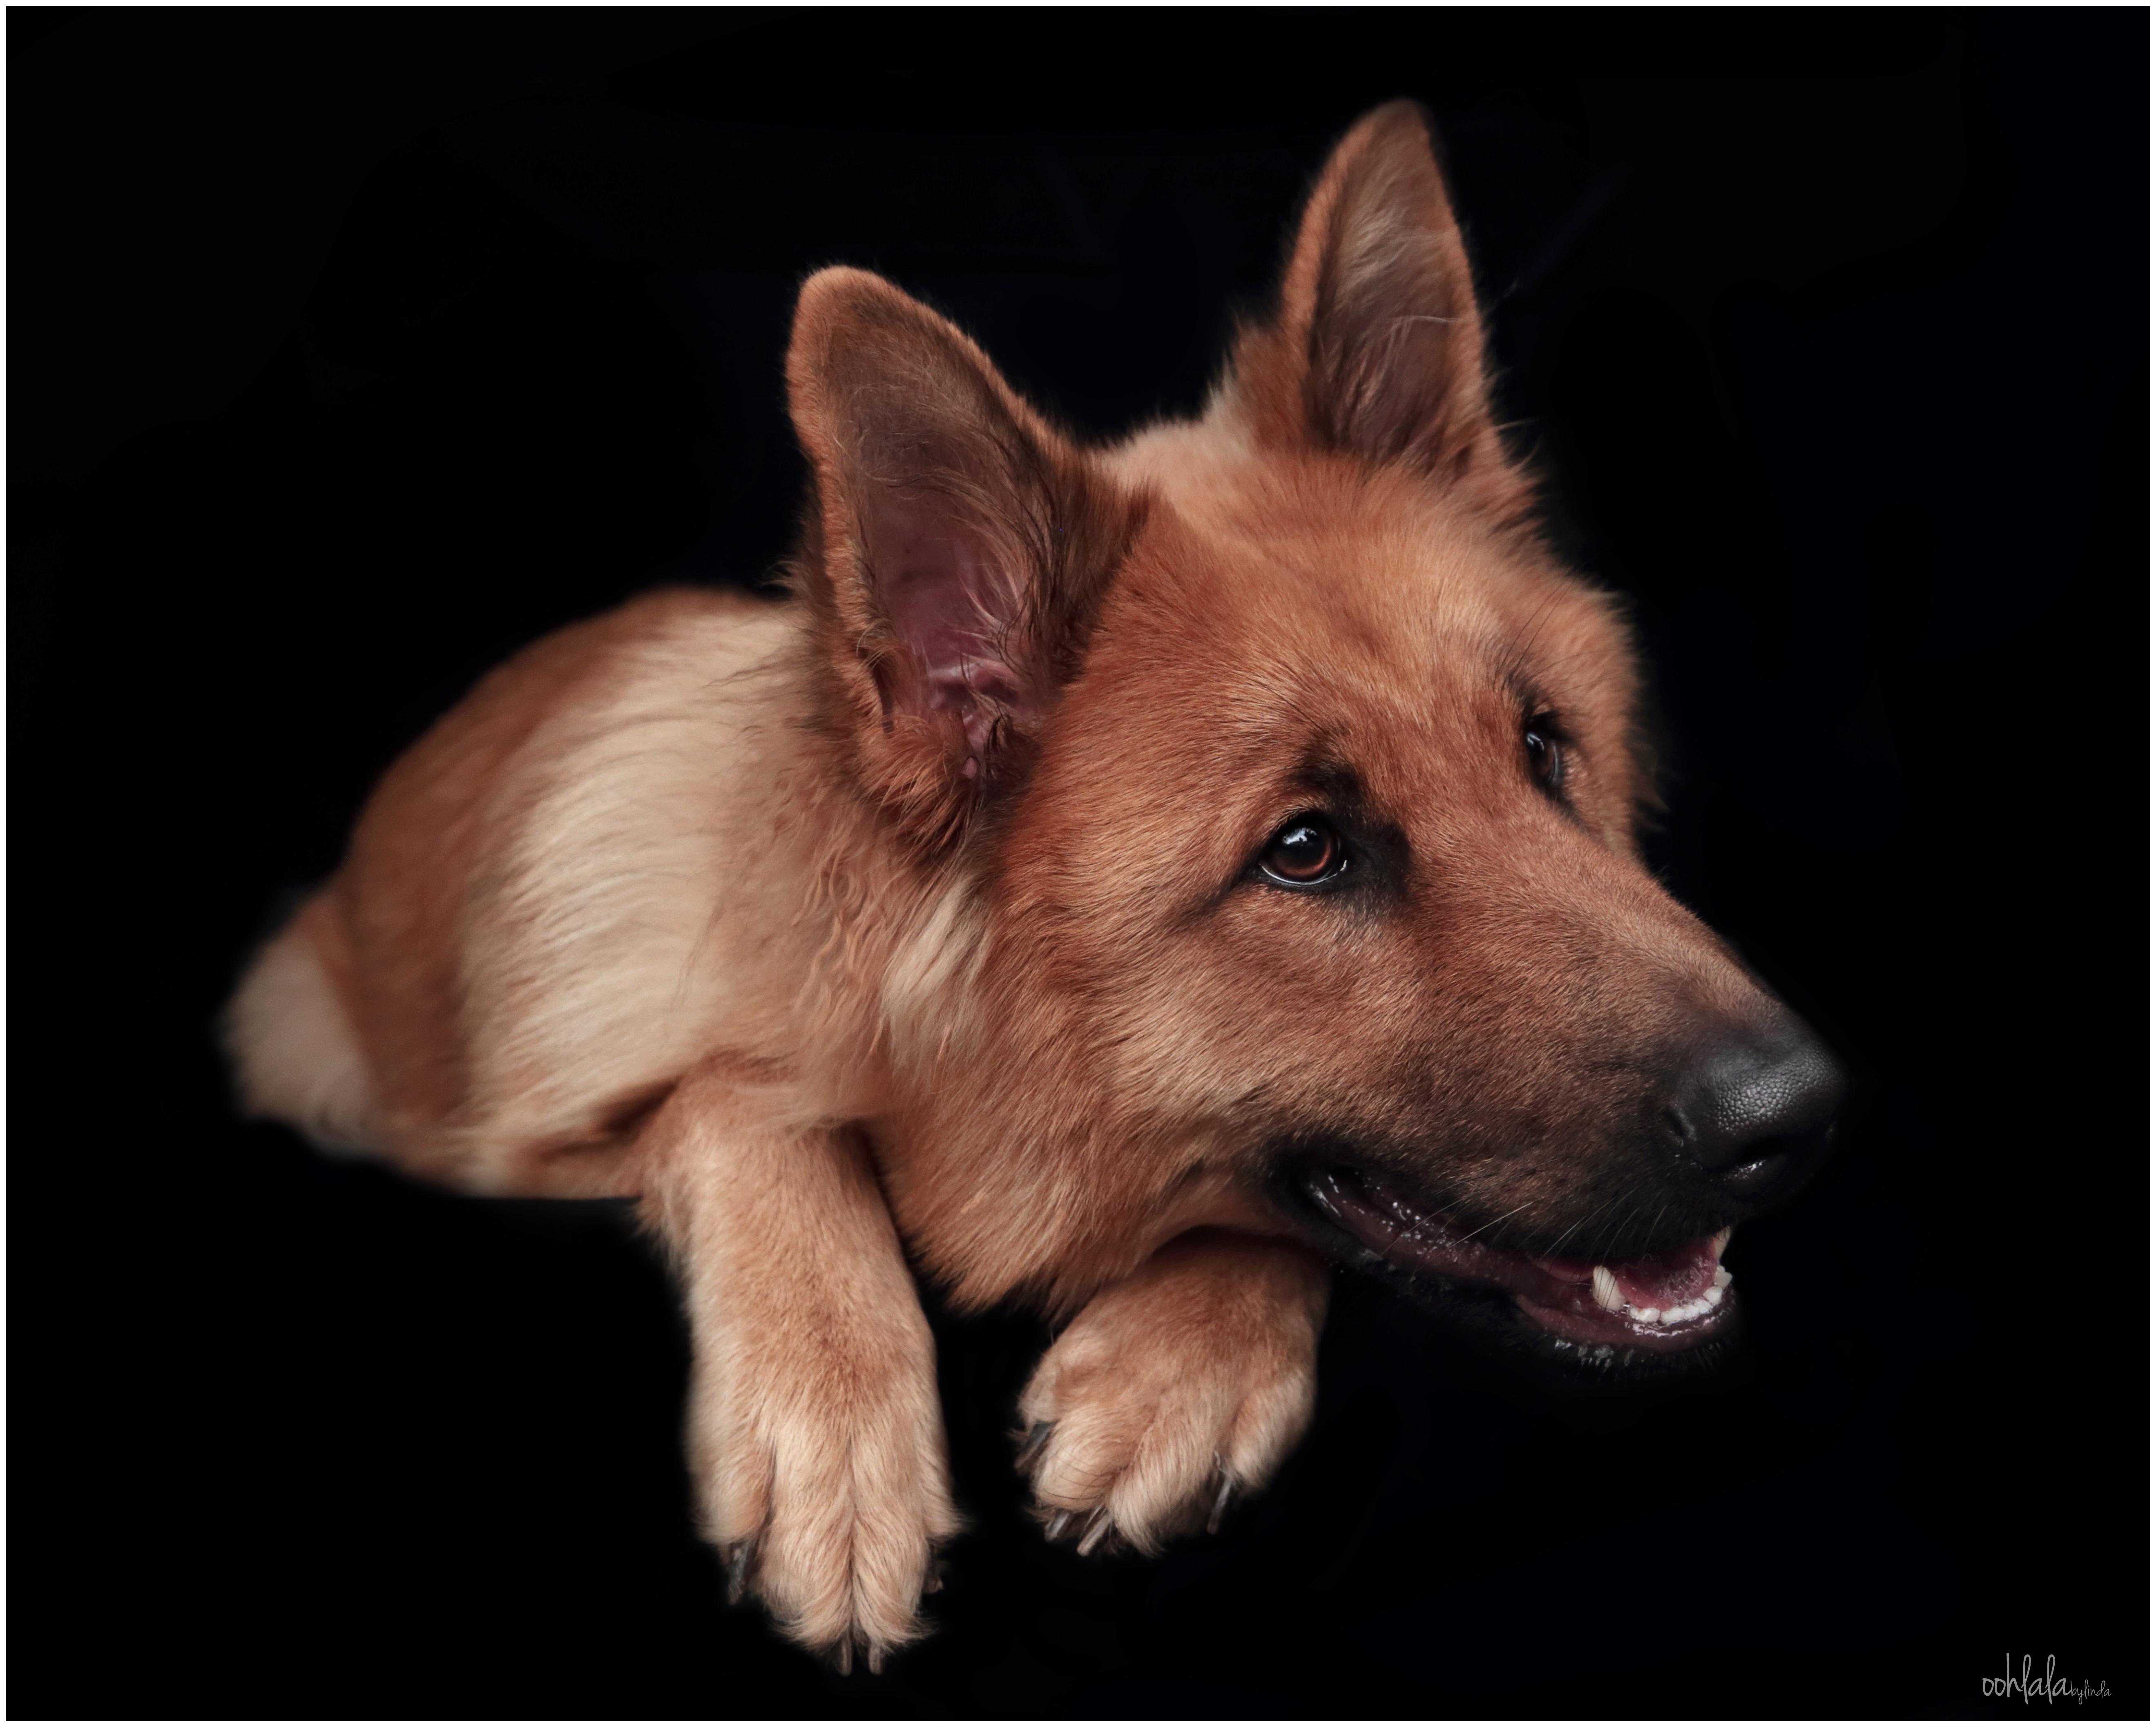 portrait of German Shepherd